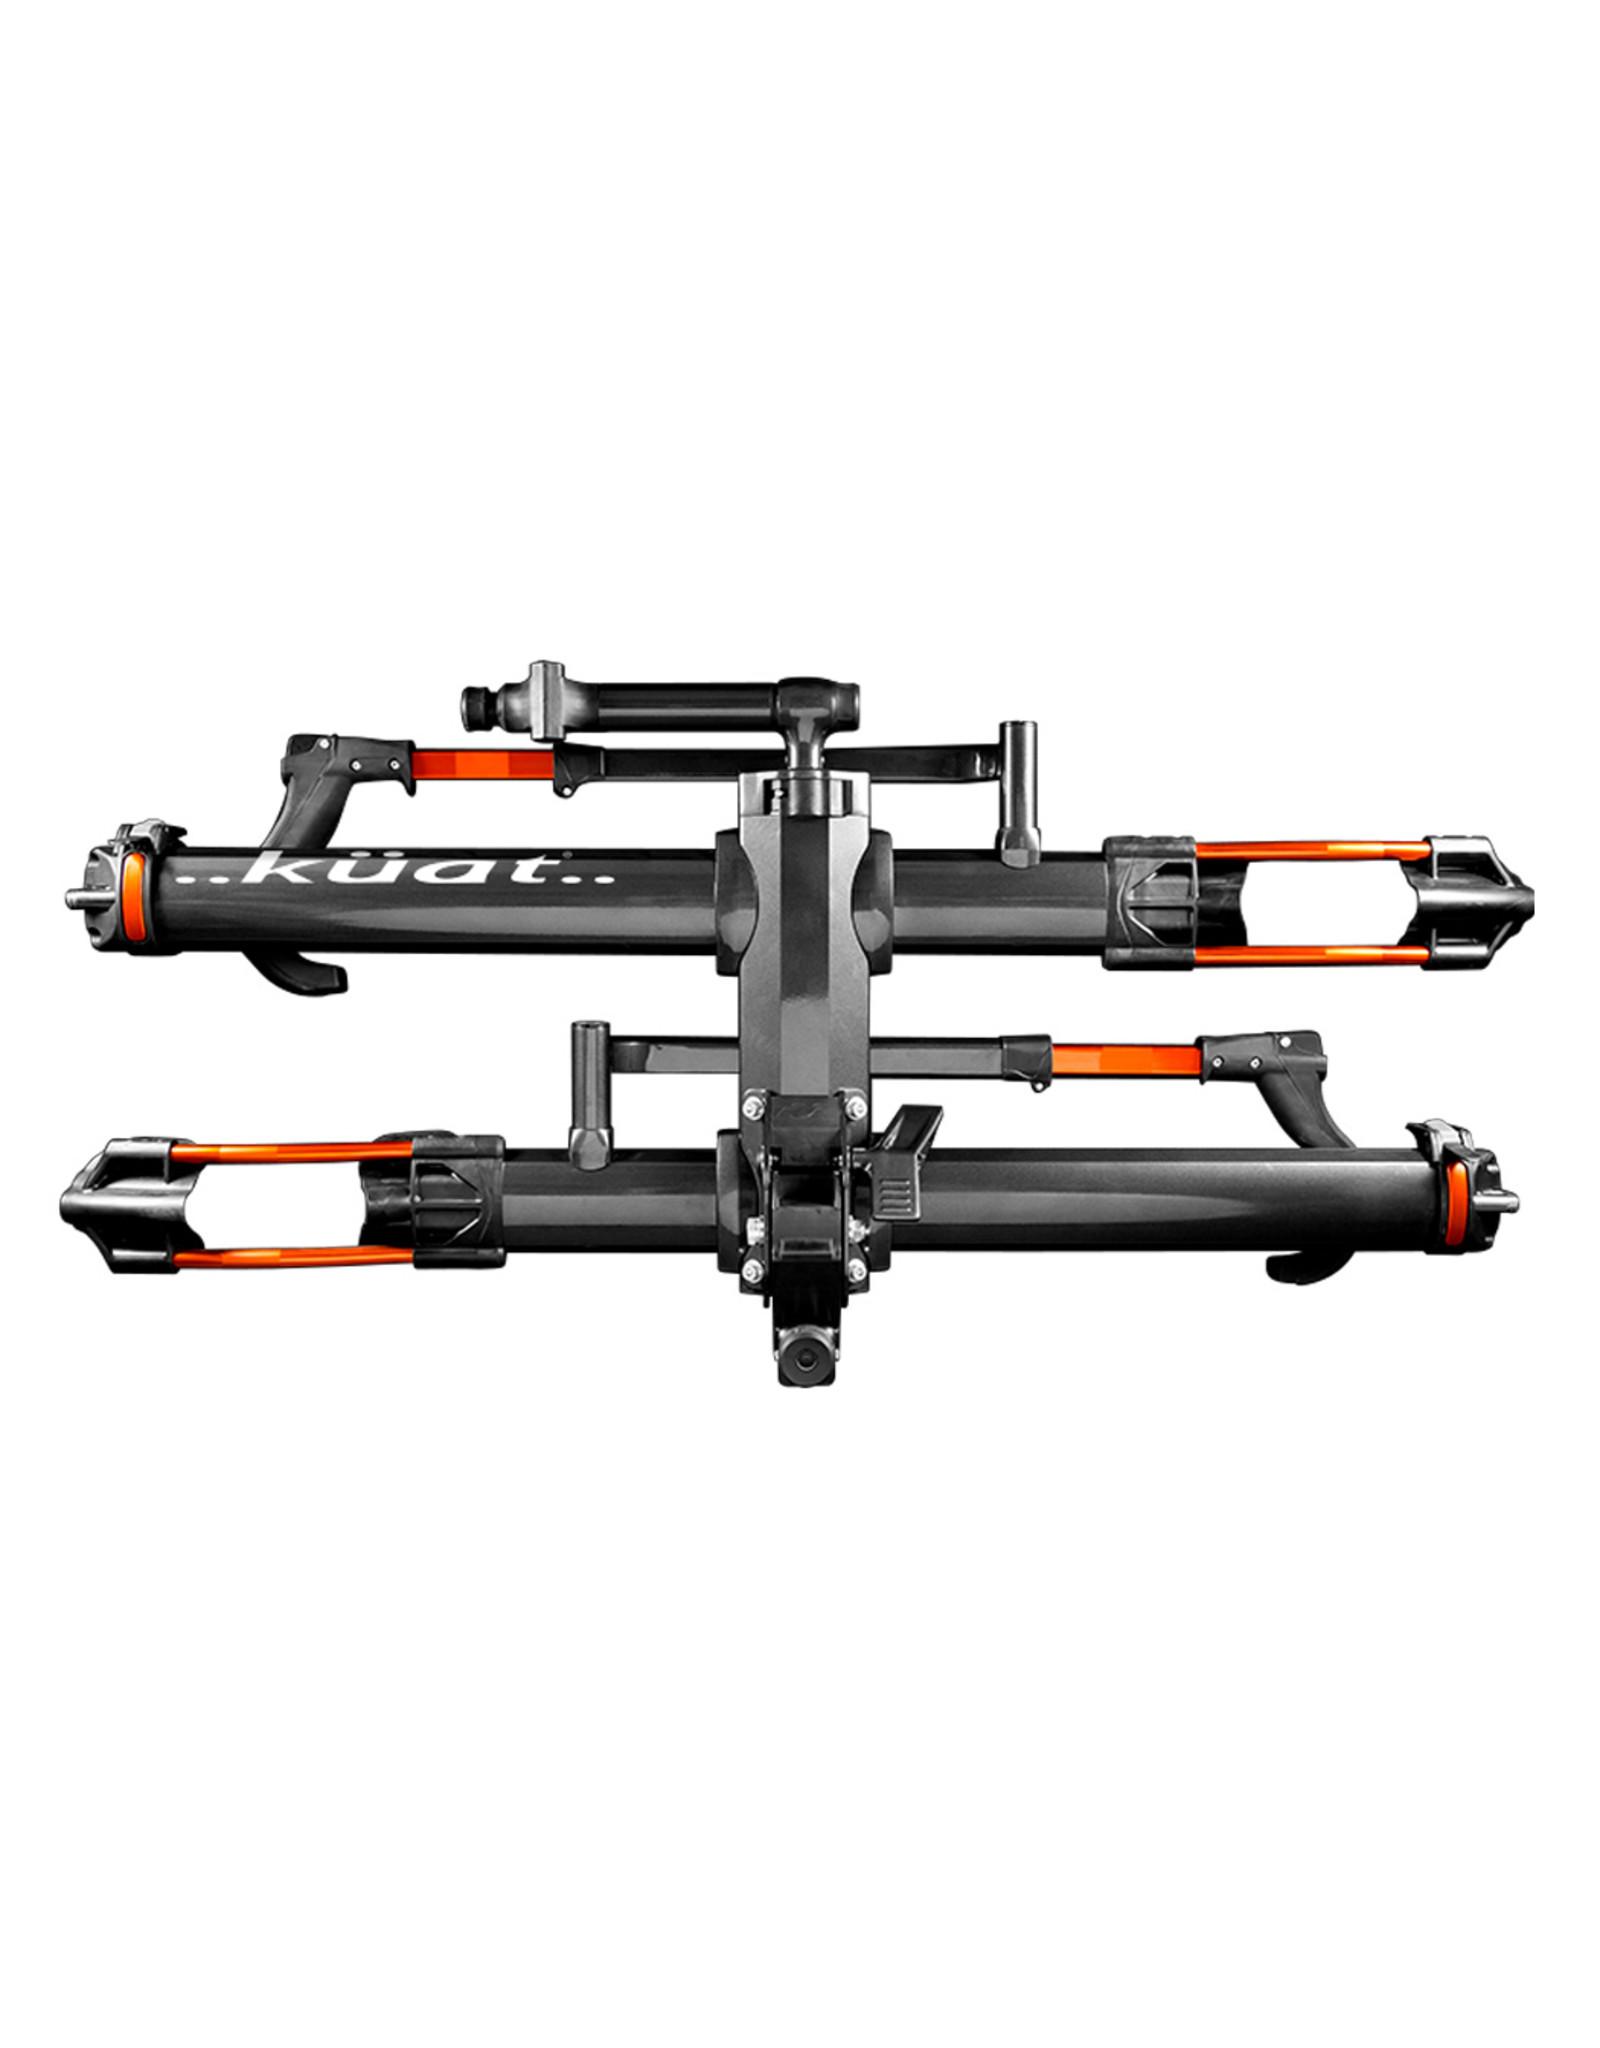 "Kuat NV 2.0 Hitch Bike Rack - 2-Bike, 2"" Receiver, Metallic Gray/Orange"